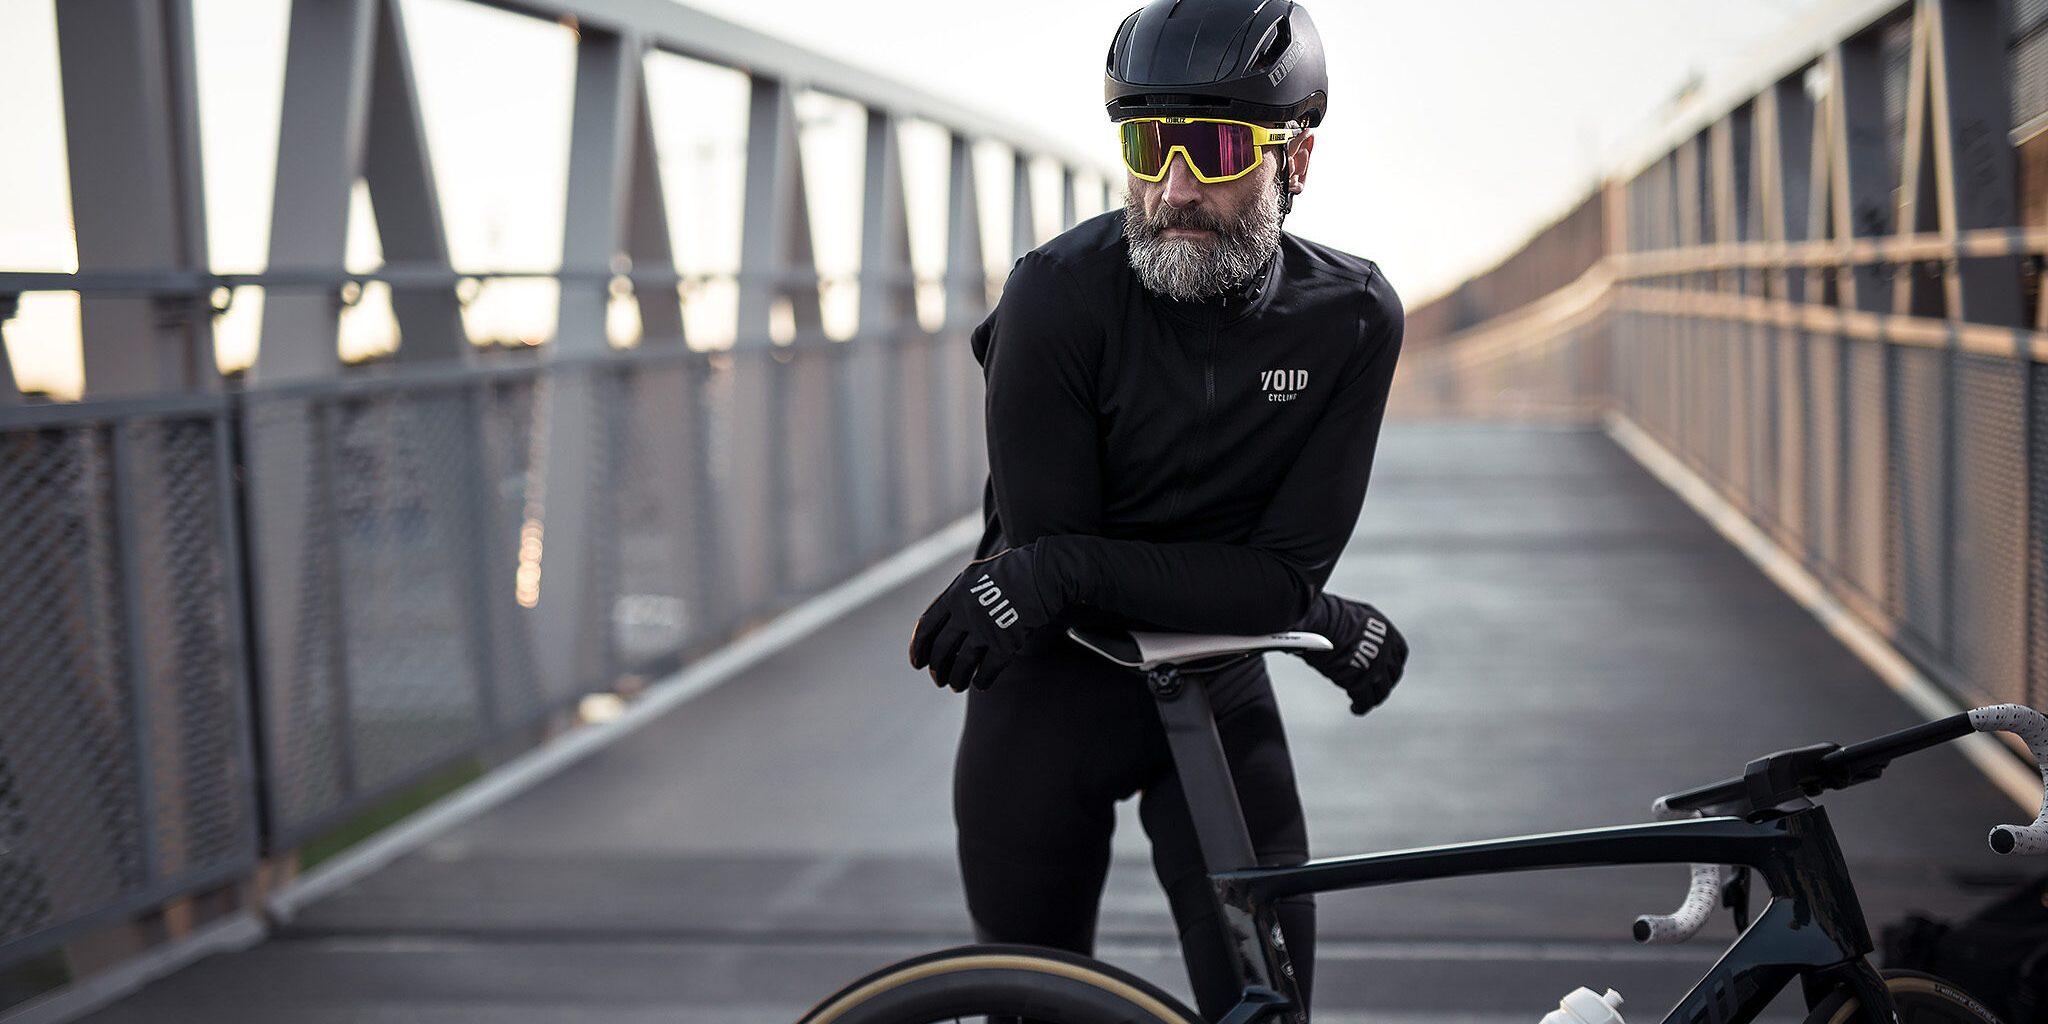 52105-64_fusion-56007-10_zonar helmet-bliz_sunglasses_cycling_yellow_sportsglasses_lifestyle2